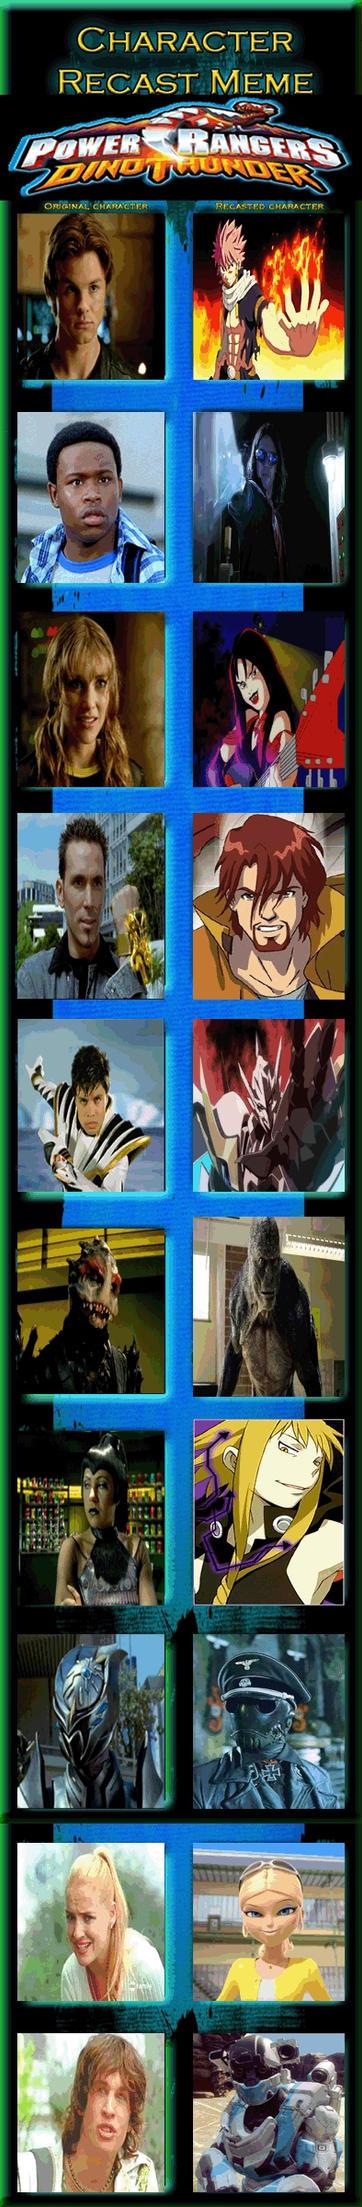 Power Rangers: Dino Thunder Recast by JackSkellington416